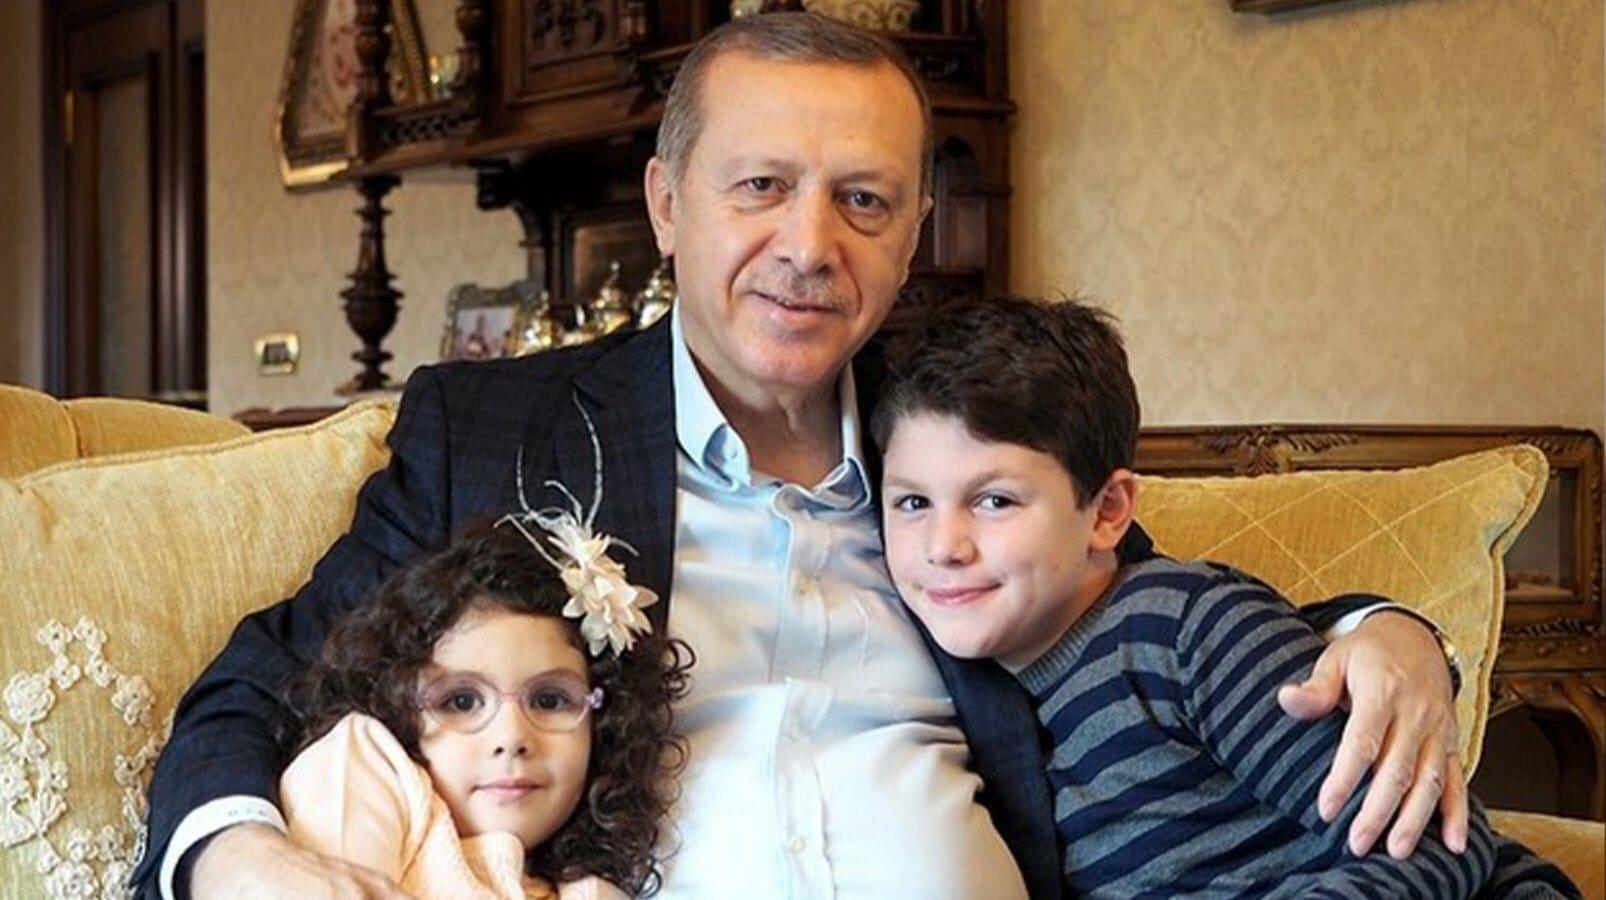 EbuNqKXXsAEz5Lu - الرئيس التركي يحتفل بحفيده الثامن